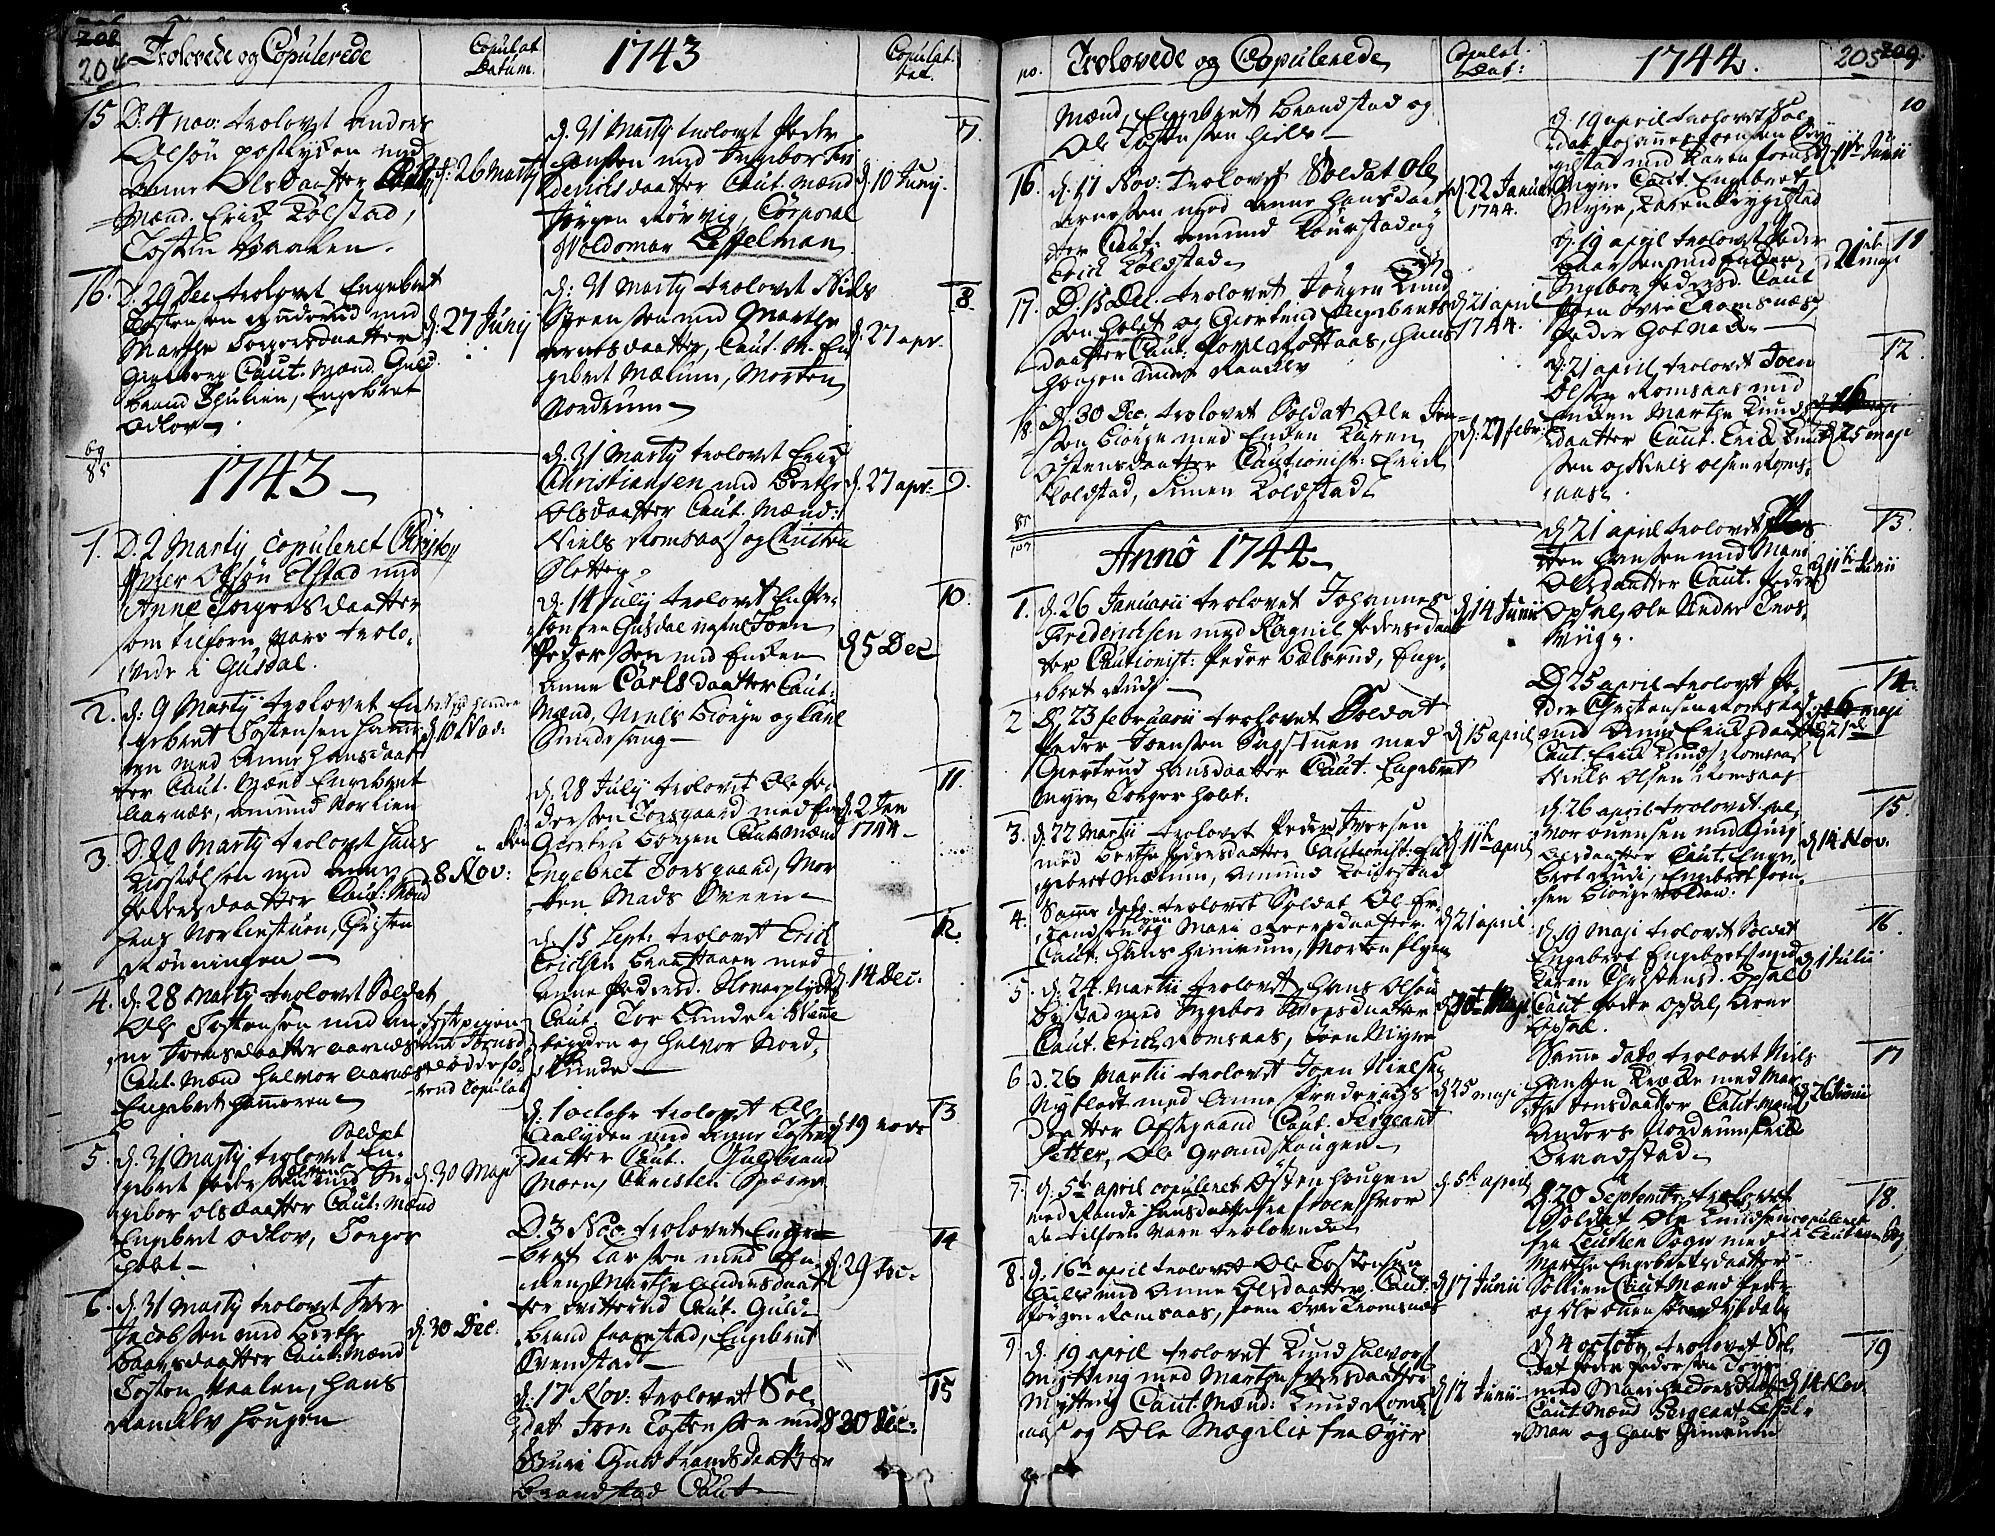 SAH, Ringebu prestekontor, Ministerialbok nr. 2, 1734-1780, s. 204-205